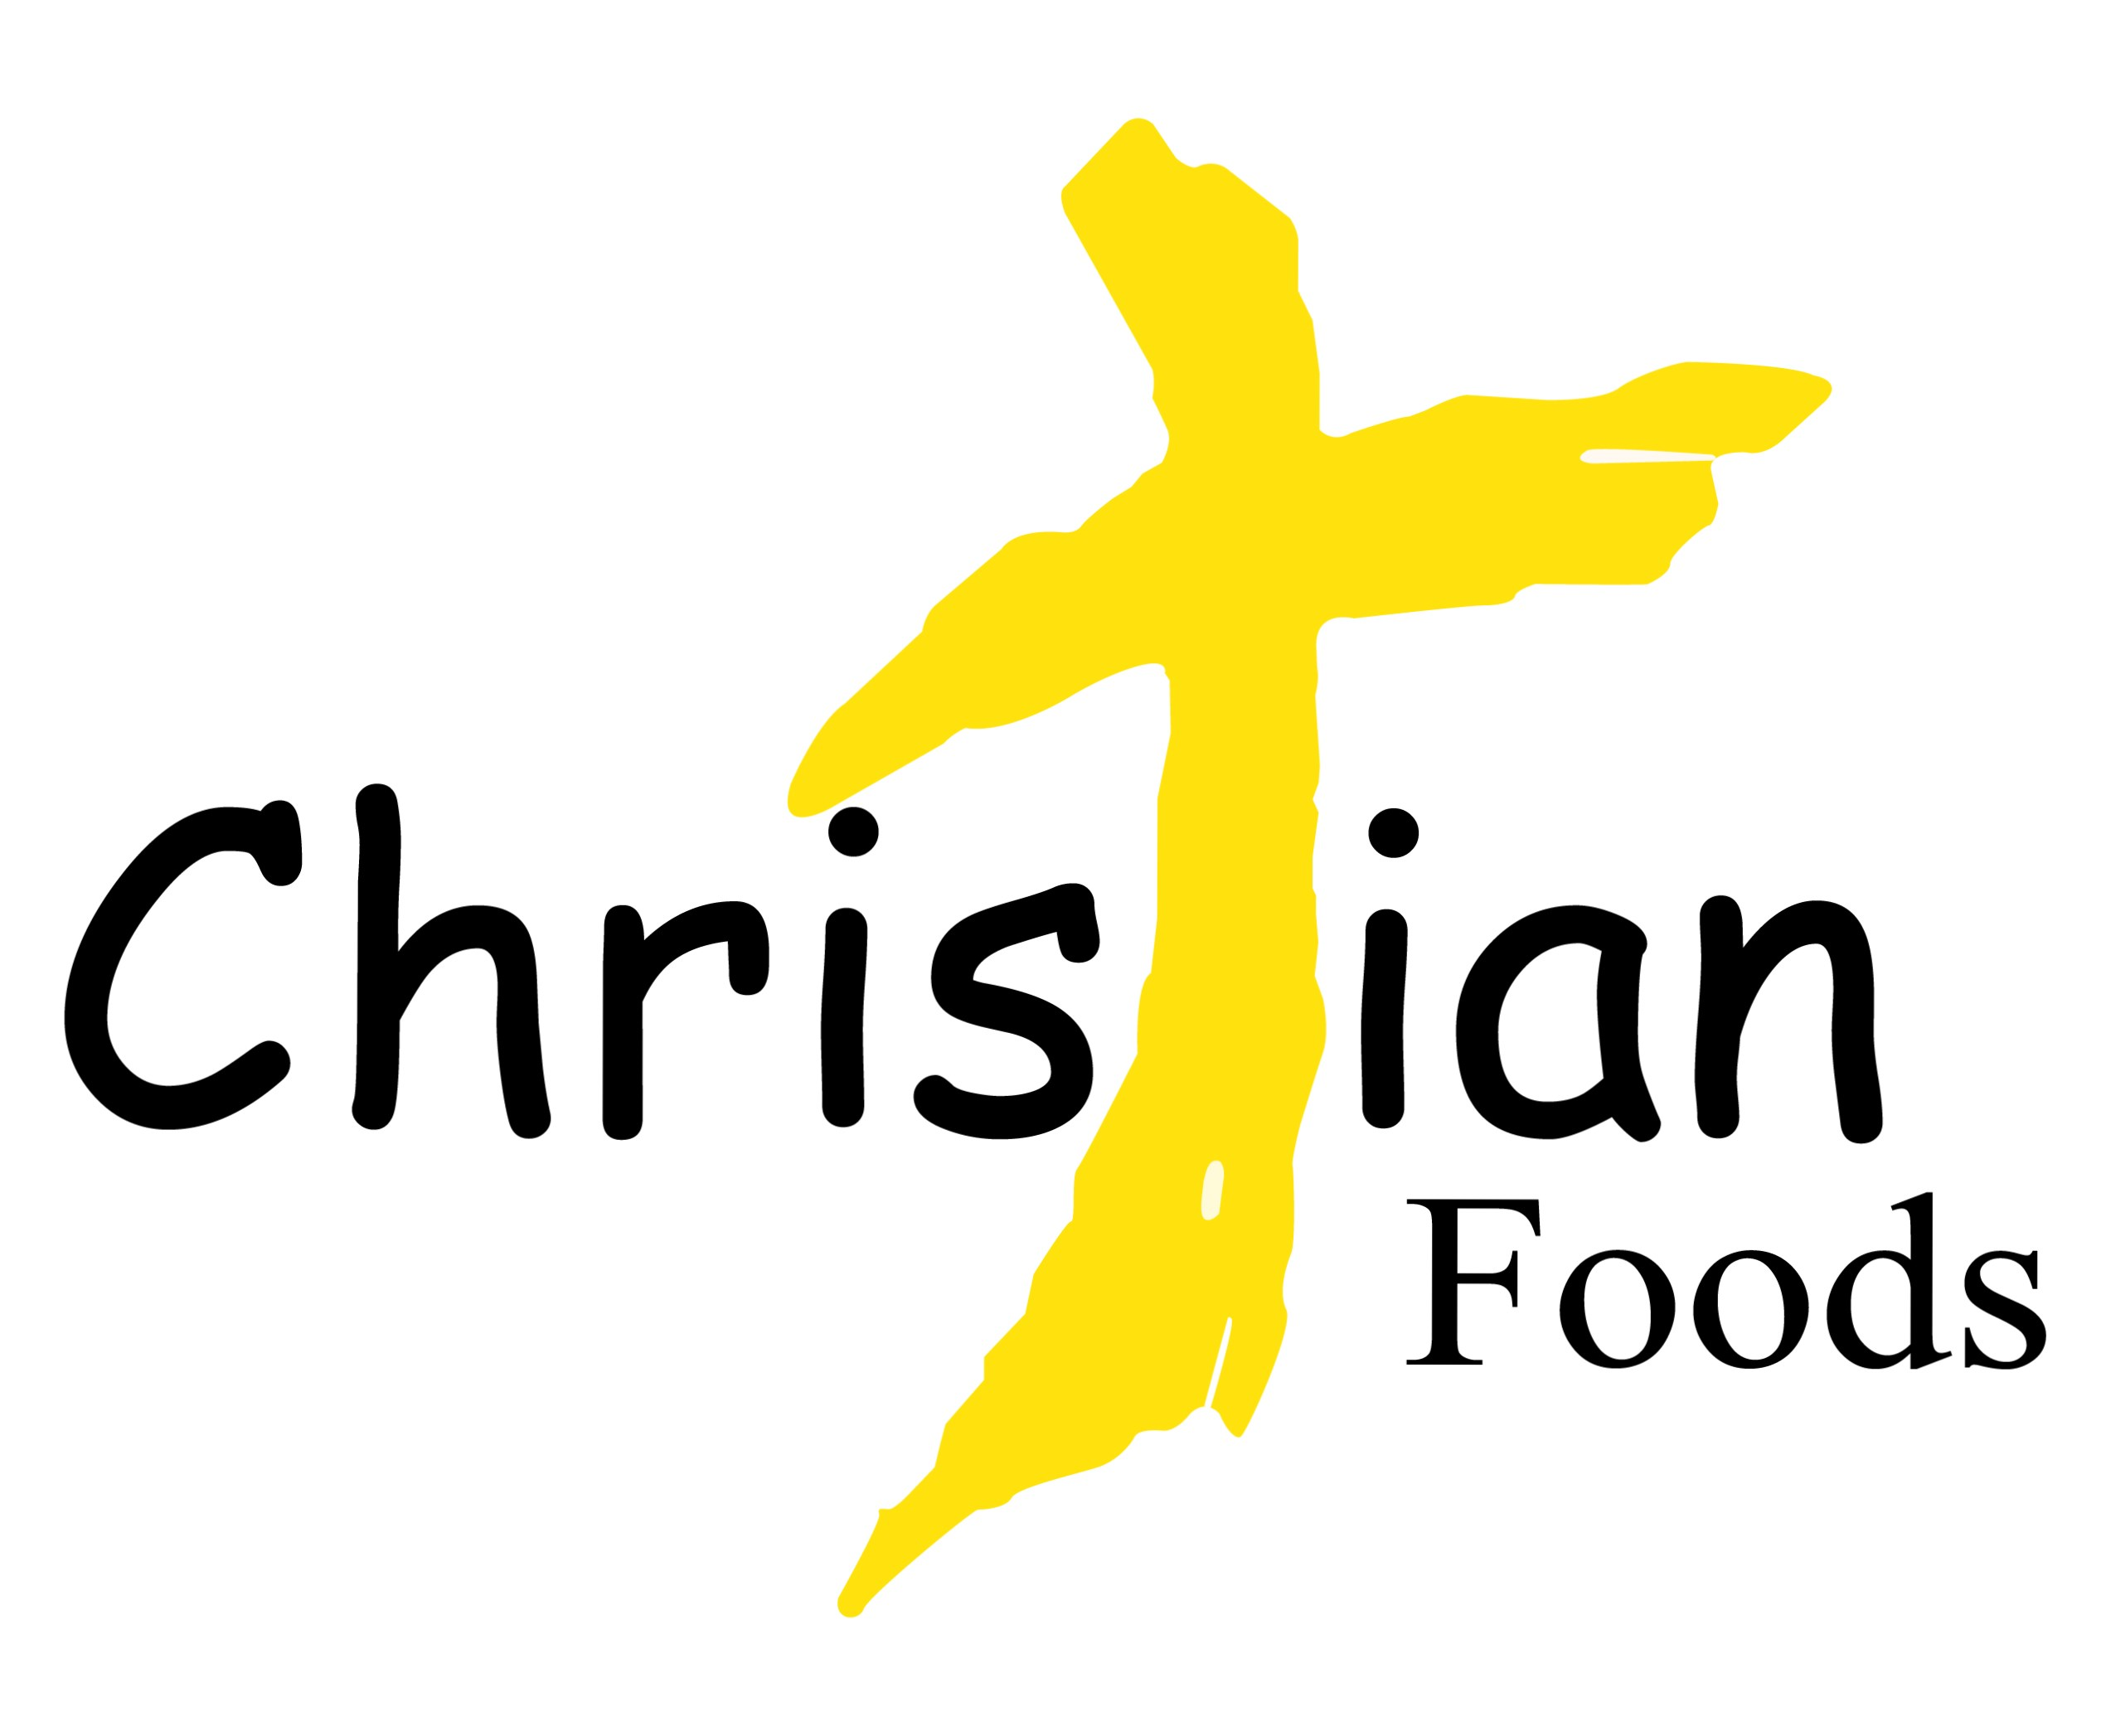 Christian Foods